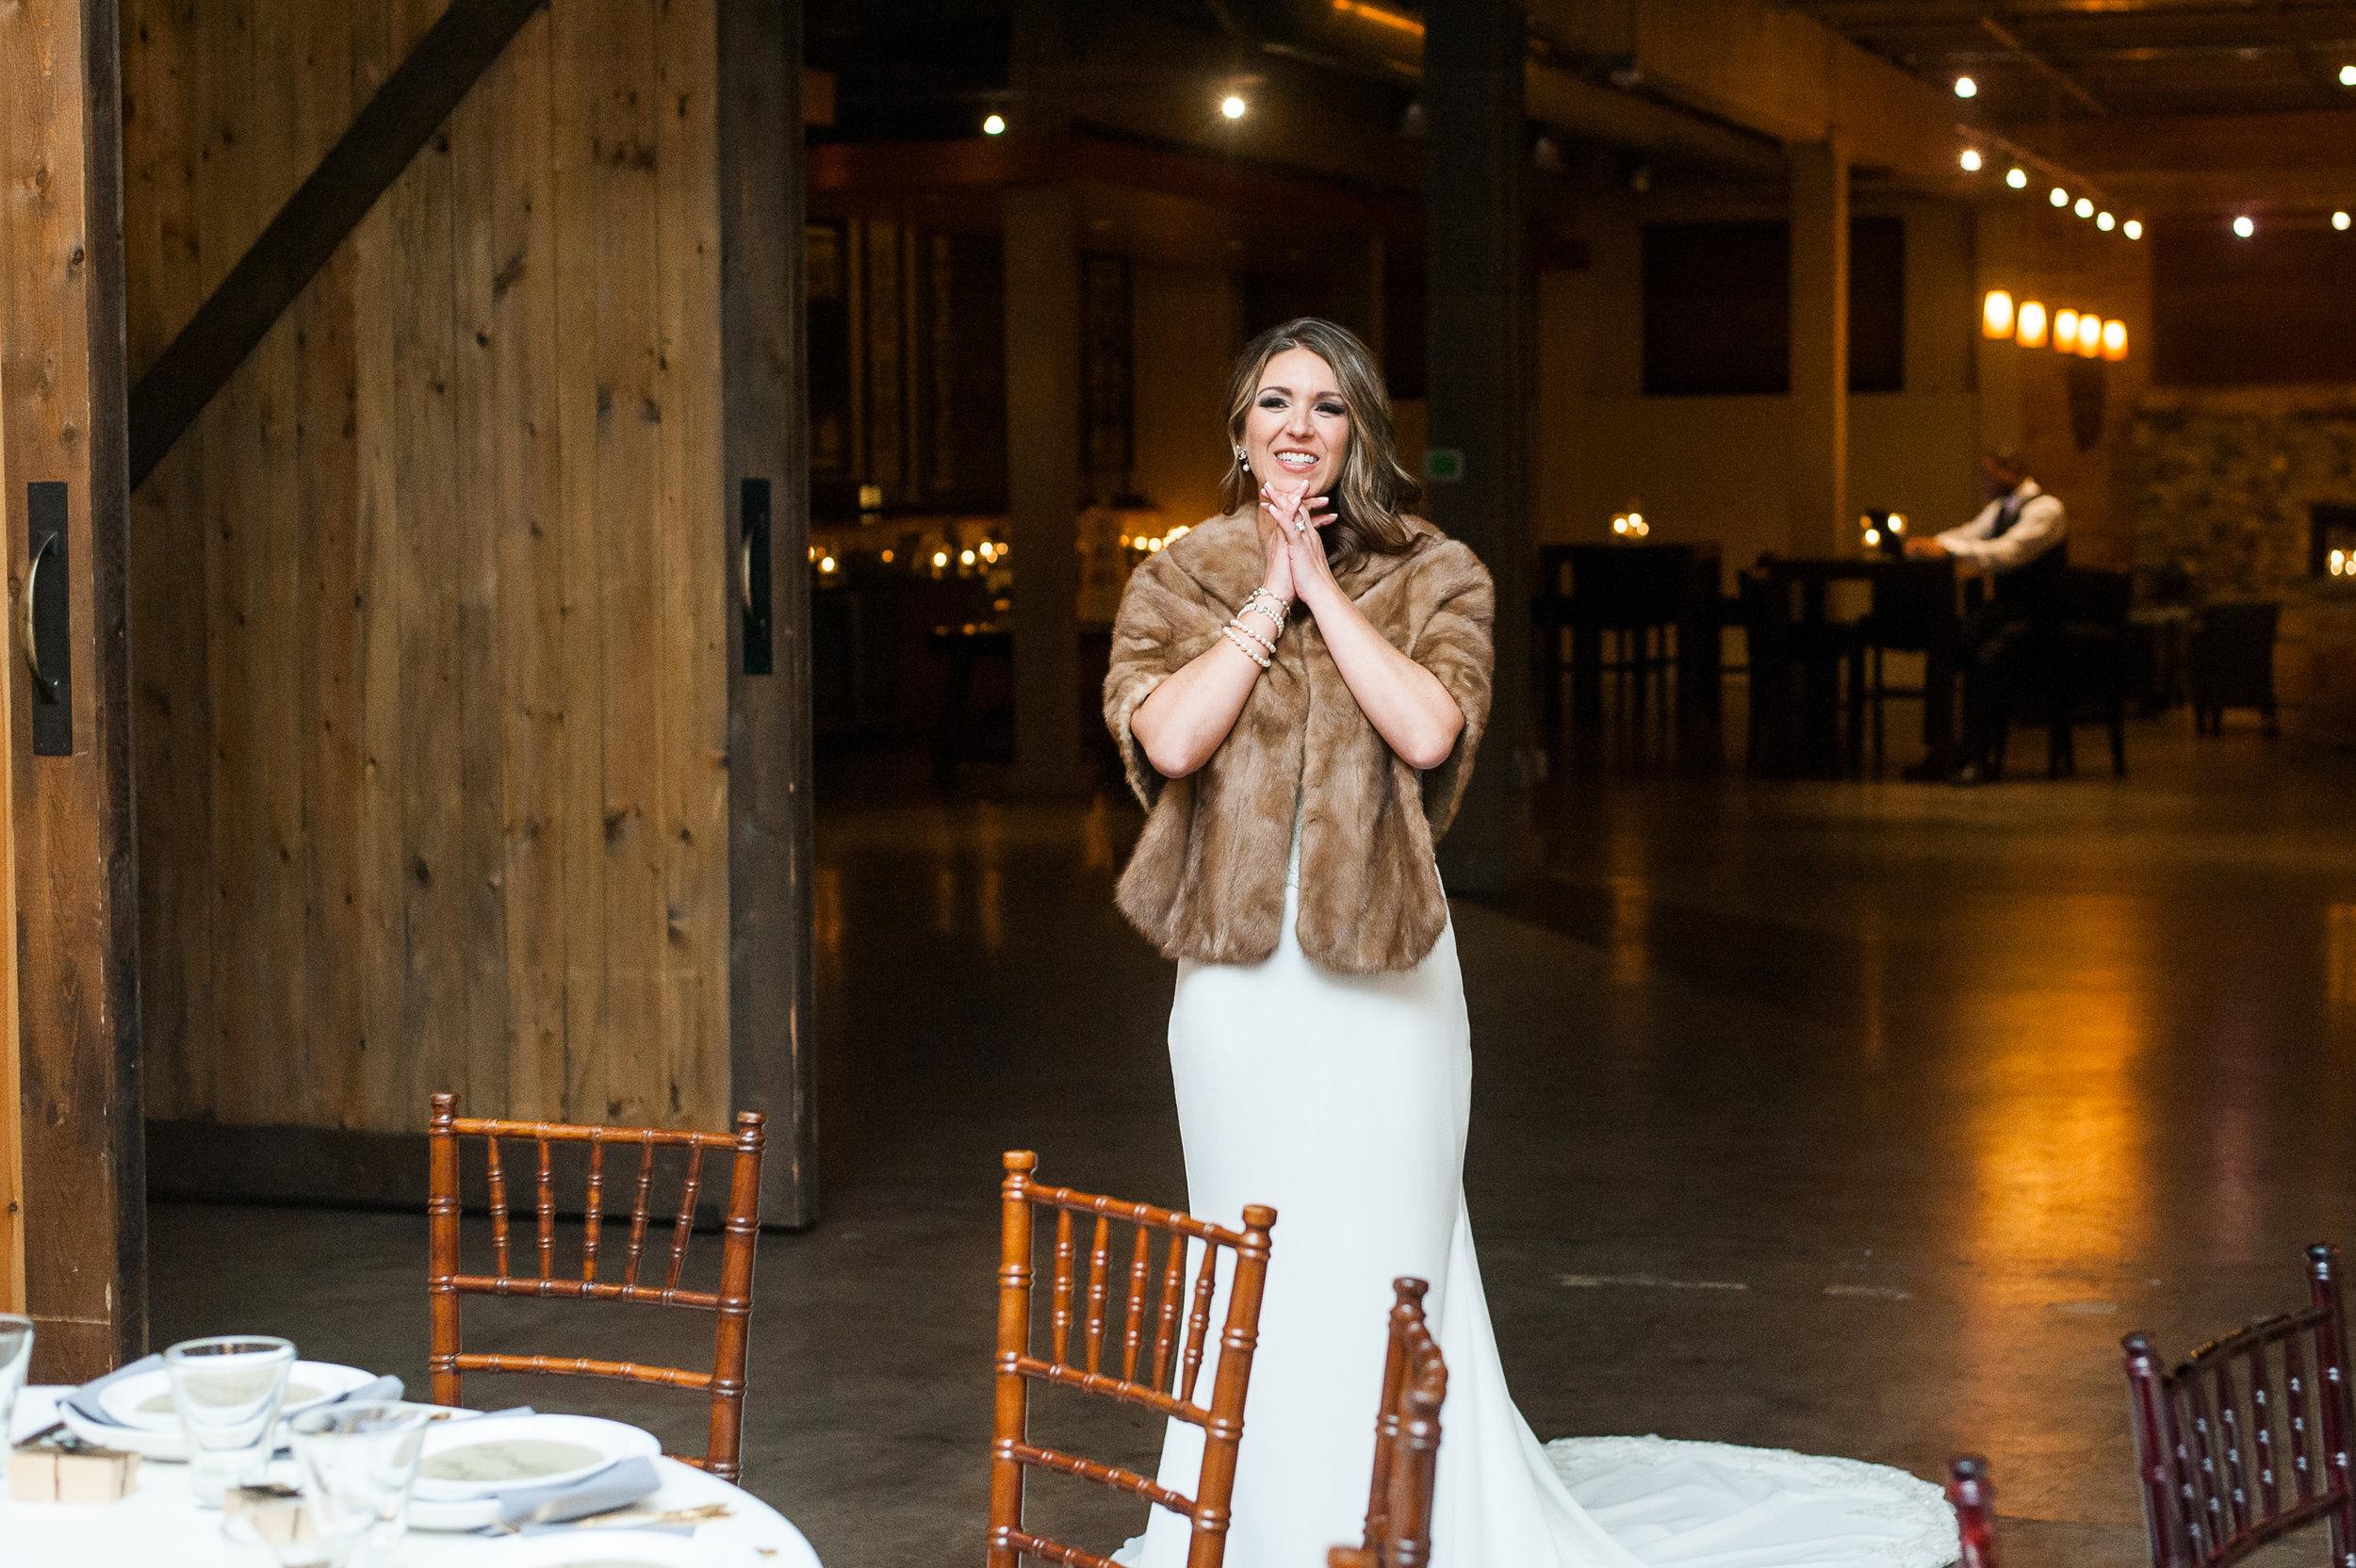 JJ-wedding-Van-Wyhe-Photography-478.jpg